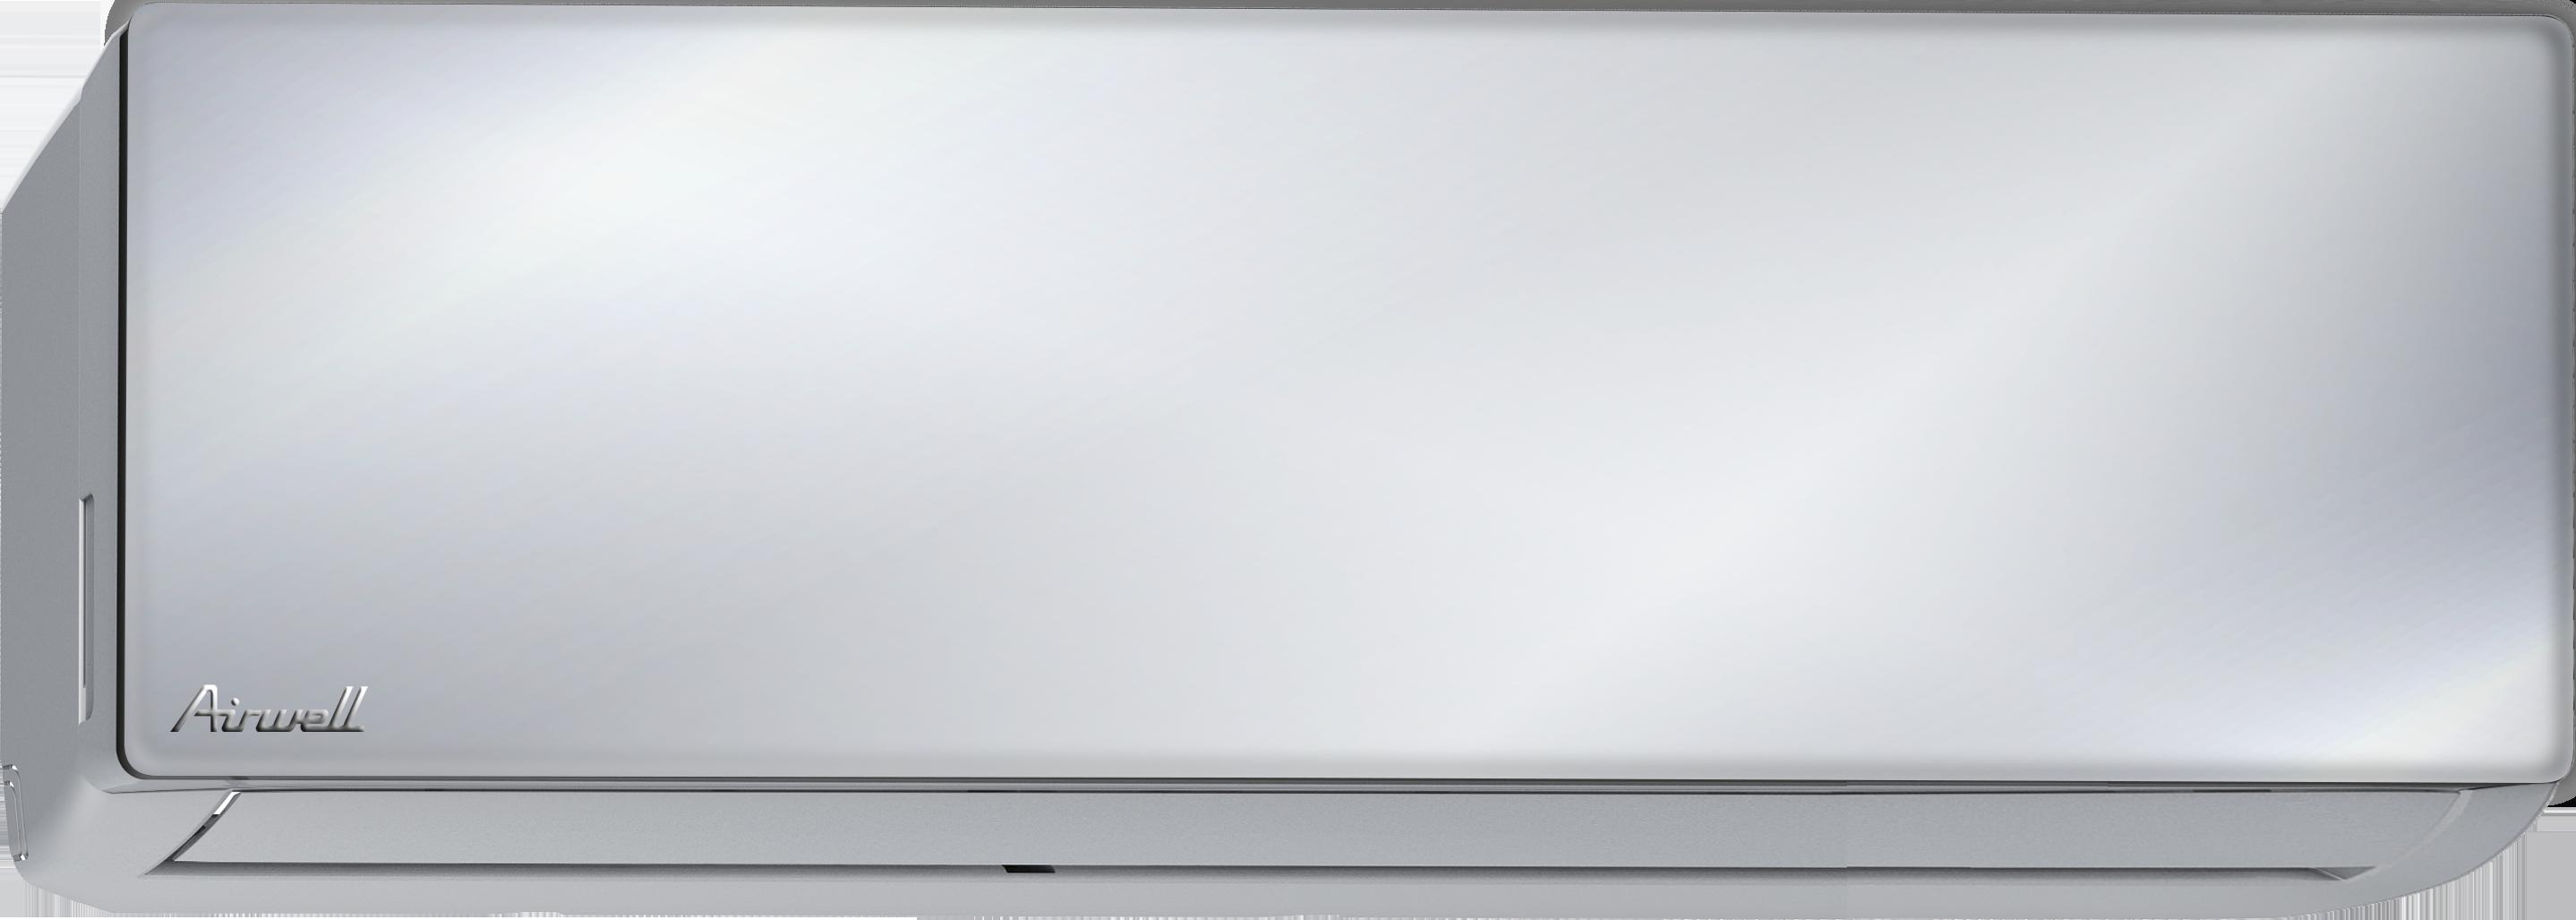 Climatiseur Airwell réversible inverter Harmonia AW-HDH012.